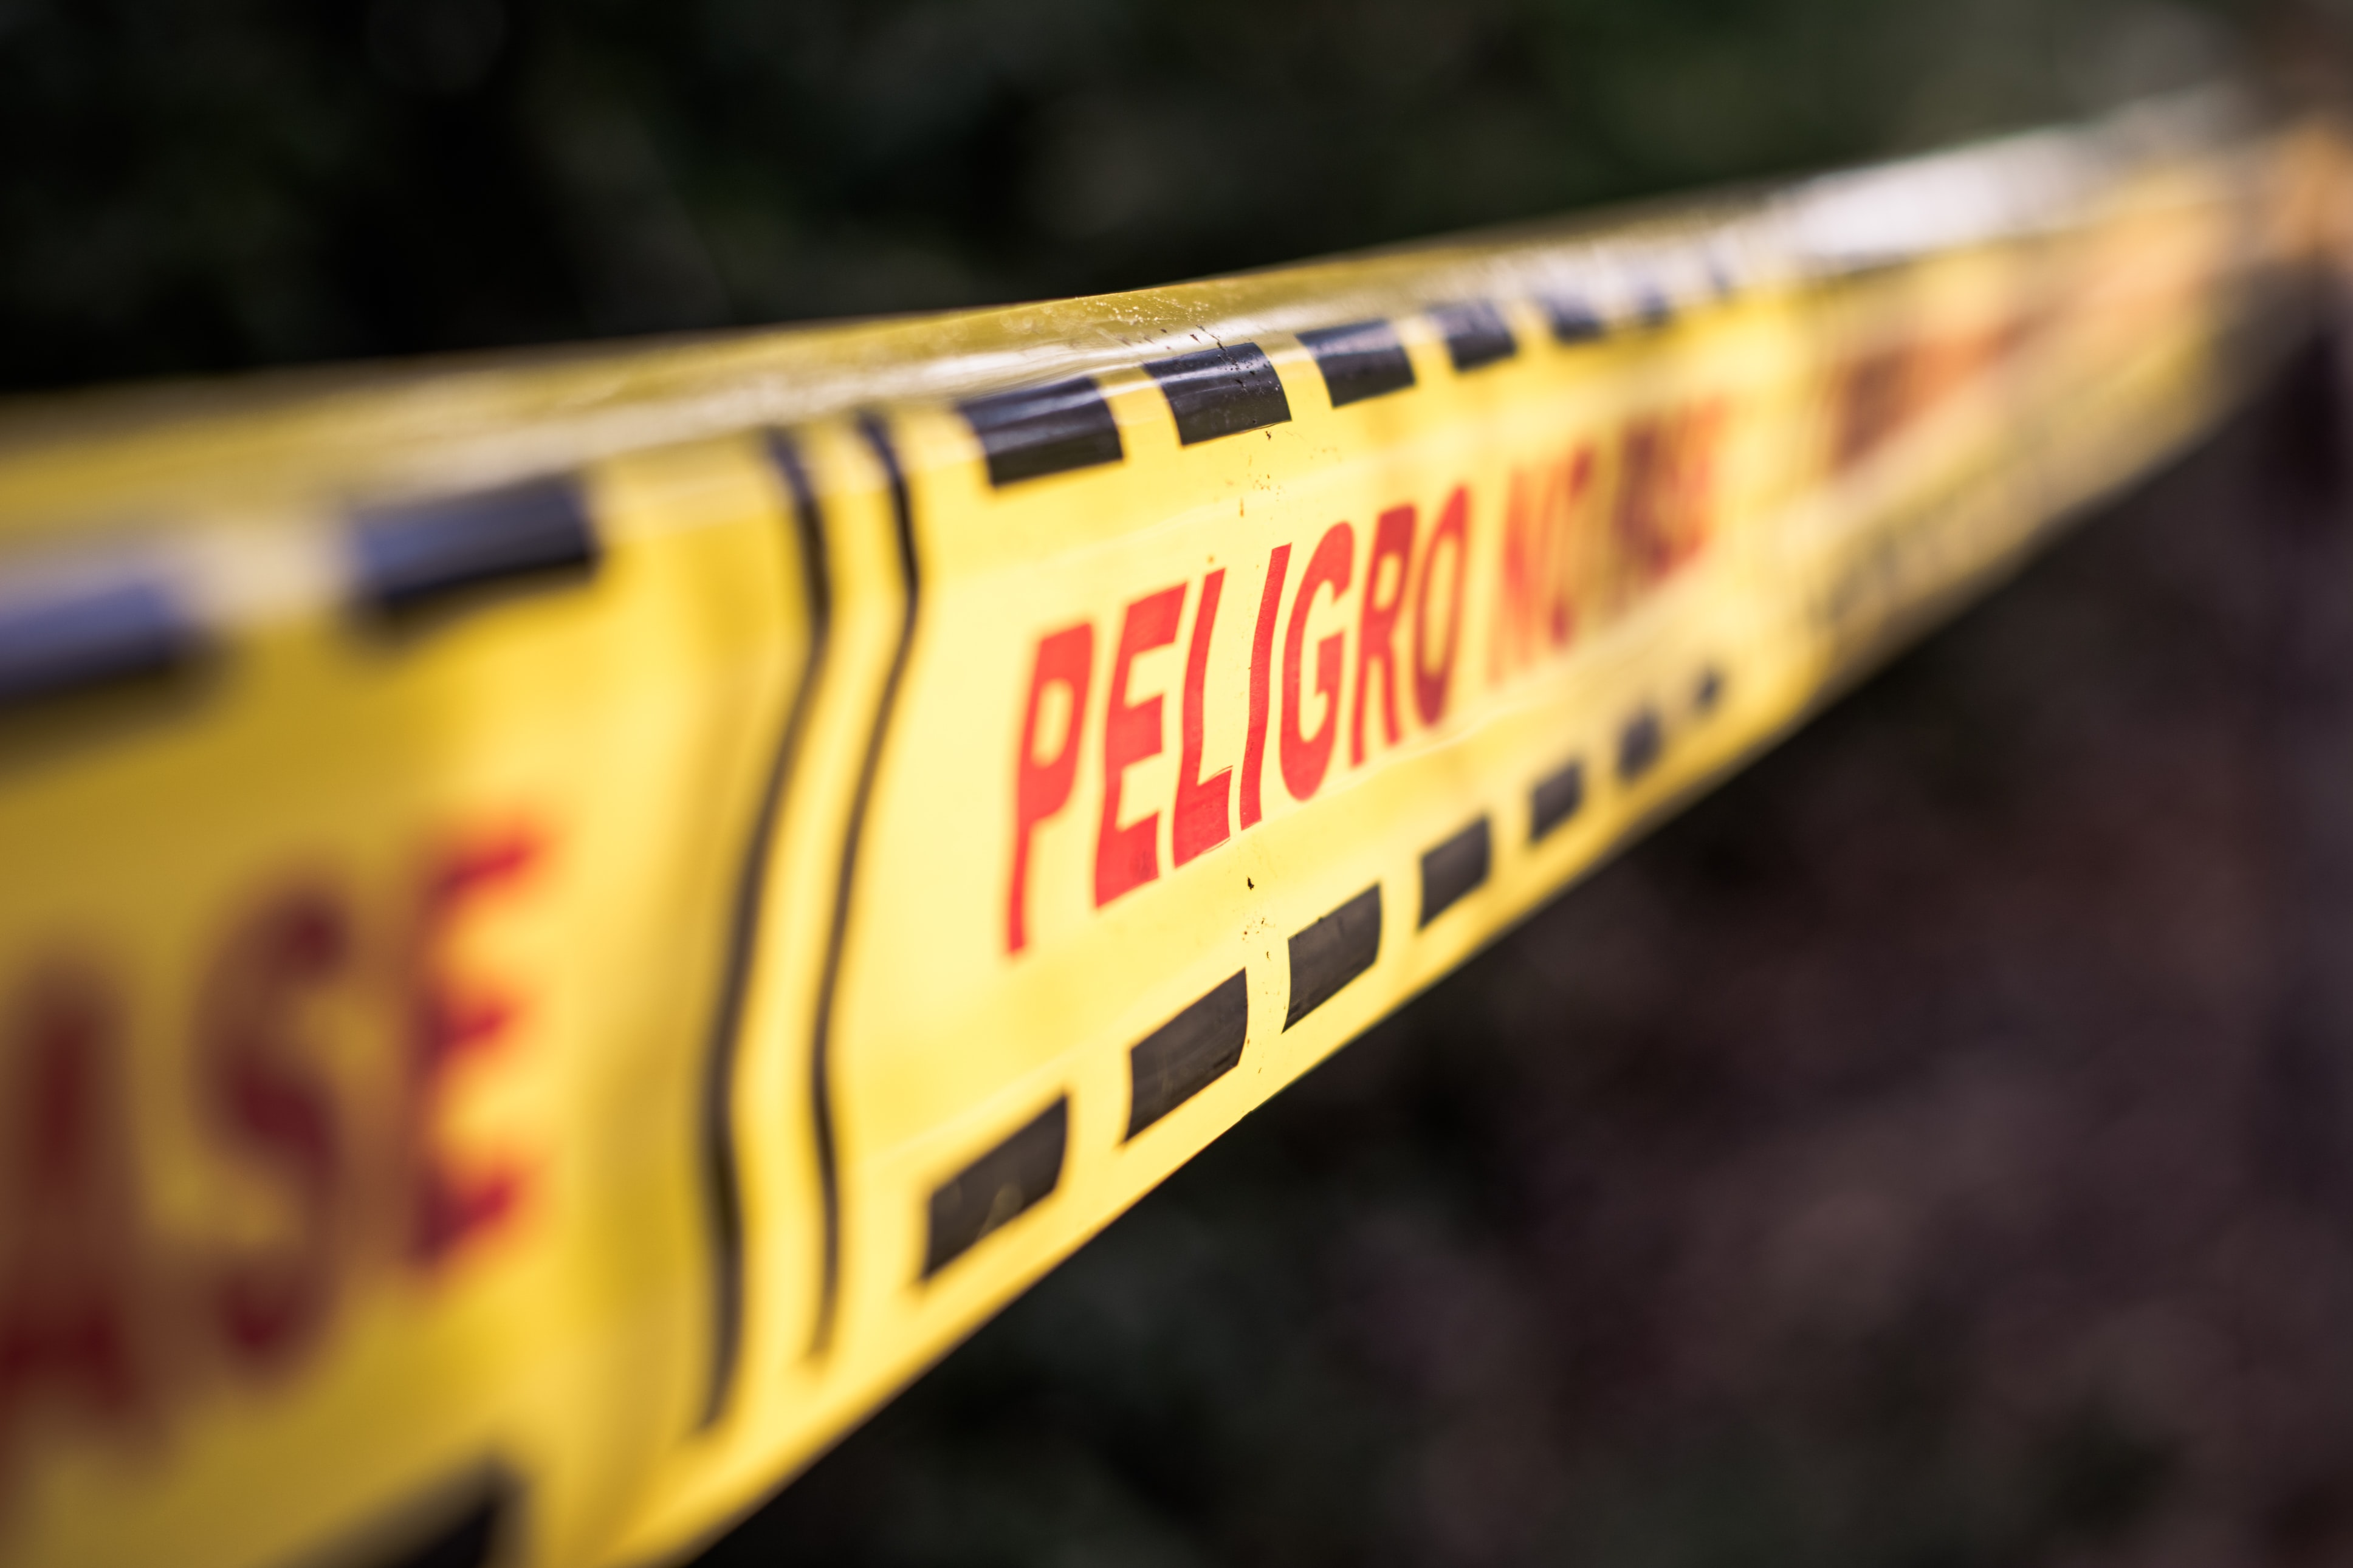 closeup photography of Peligro signage